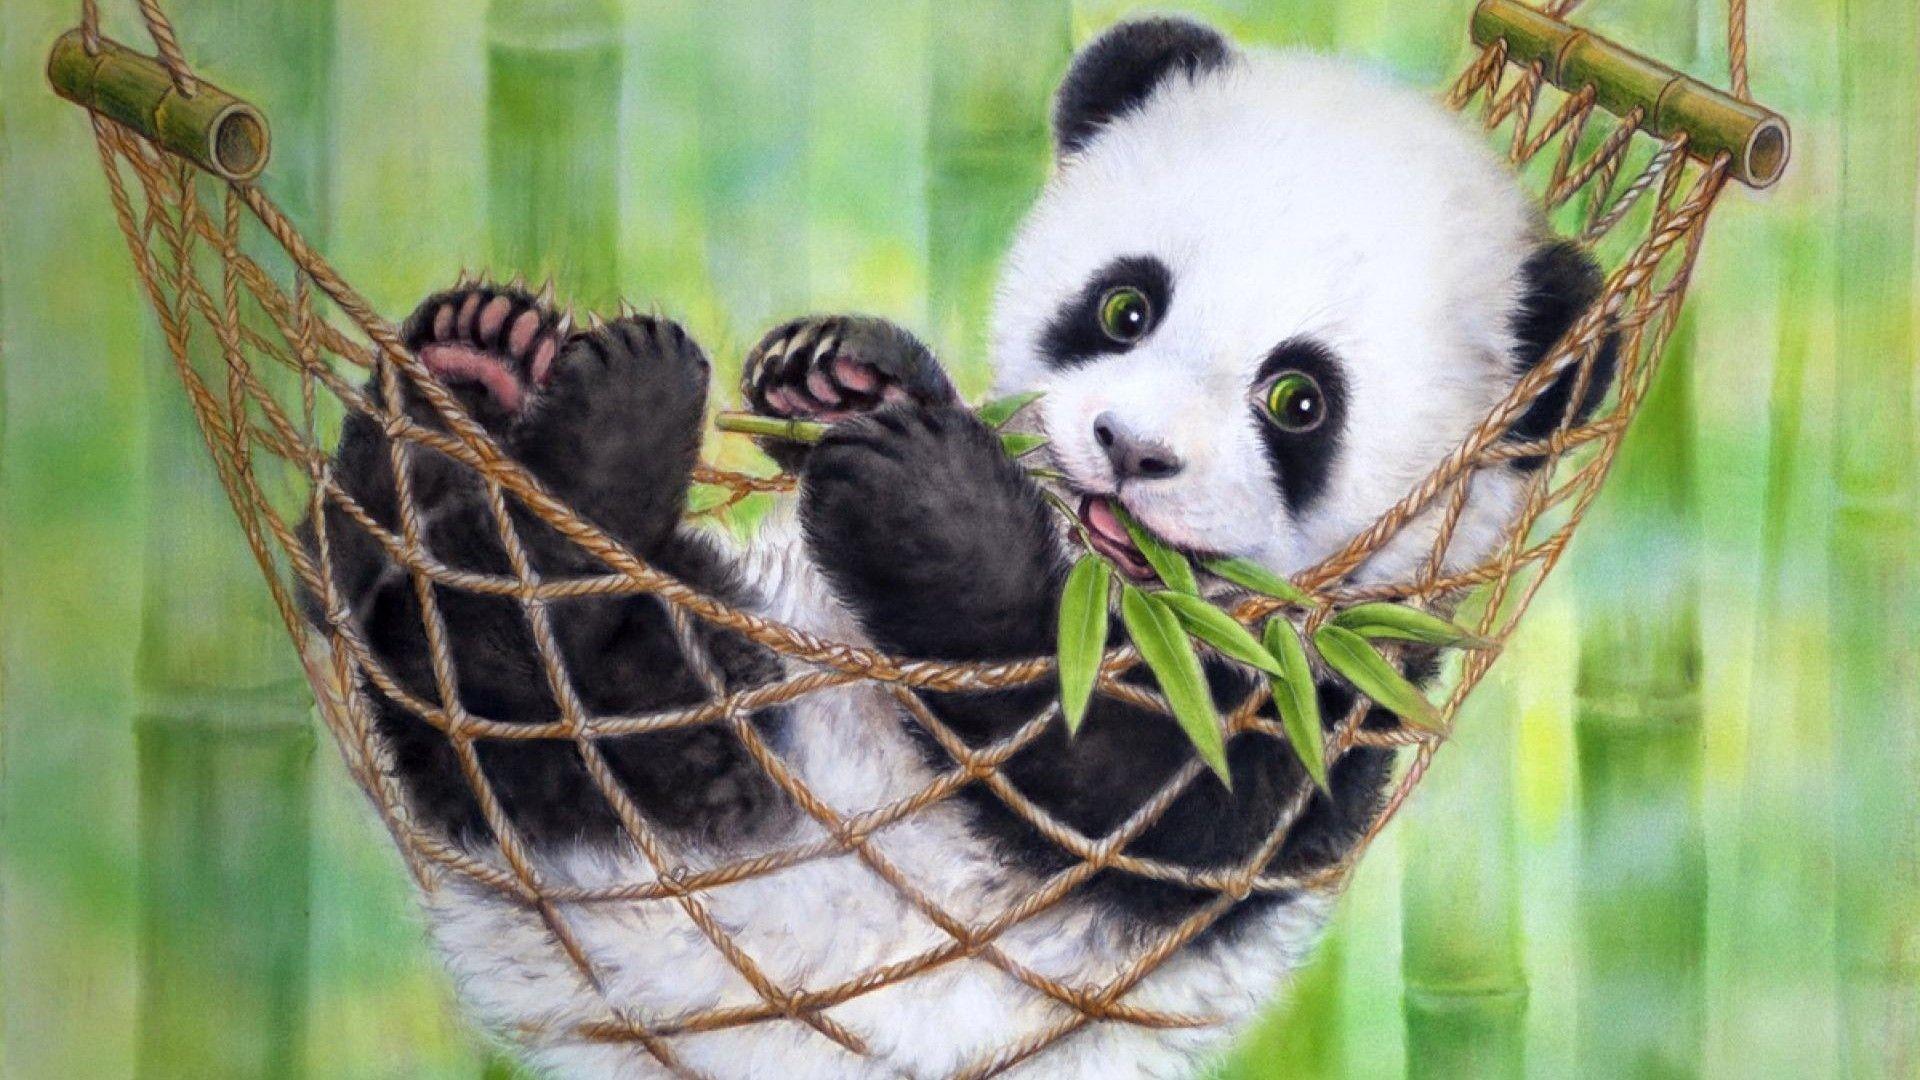 Res: 1920x1080, Simeon Panda HD desktop wallpaper : High Definition 1920×1080 Panda Pics  Wallpapers (38 Wallpapers)   Adorable Wallpapers